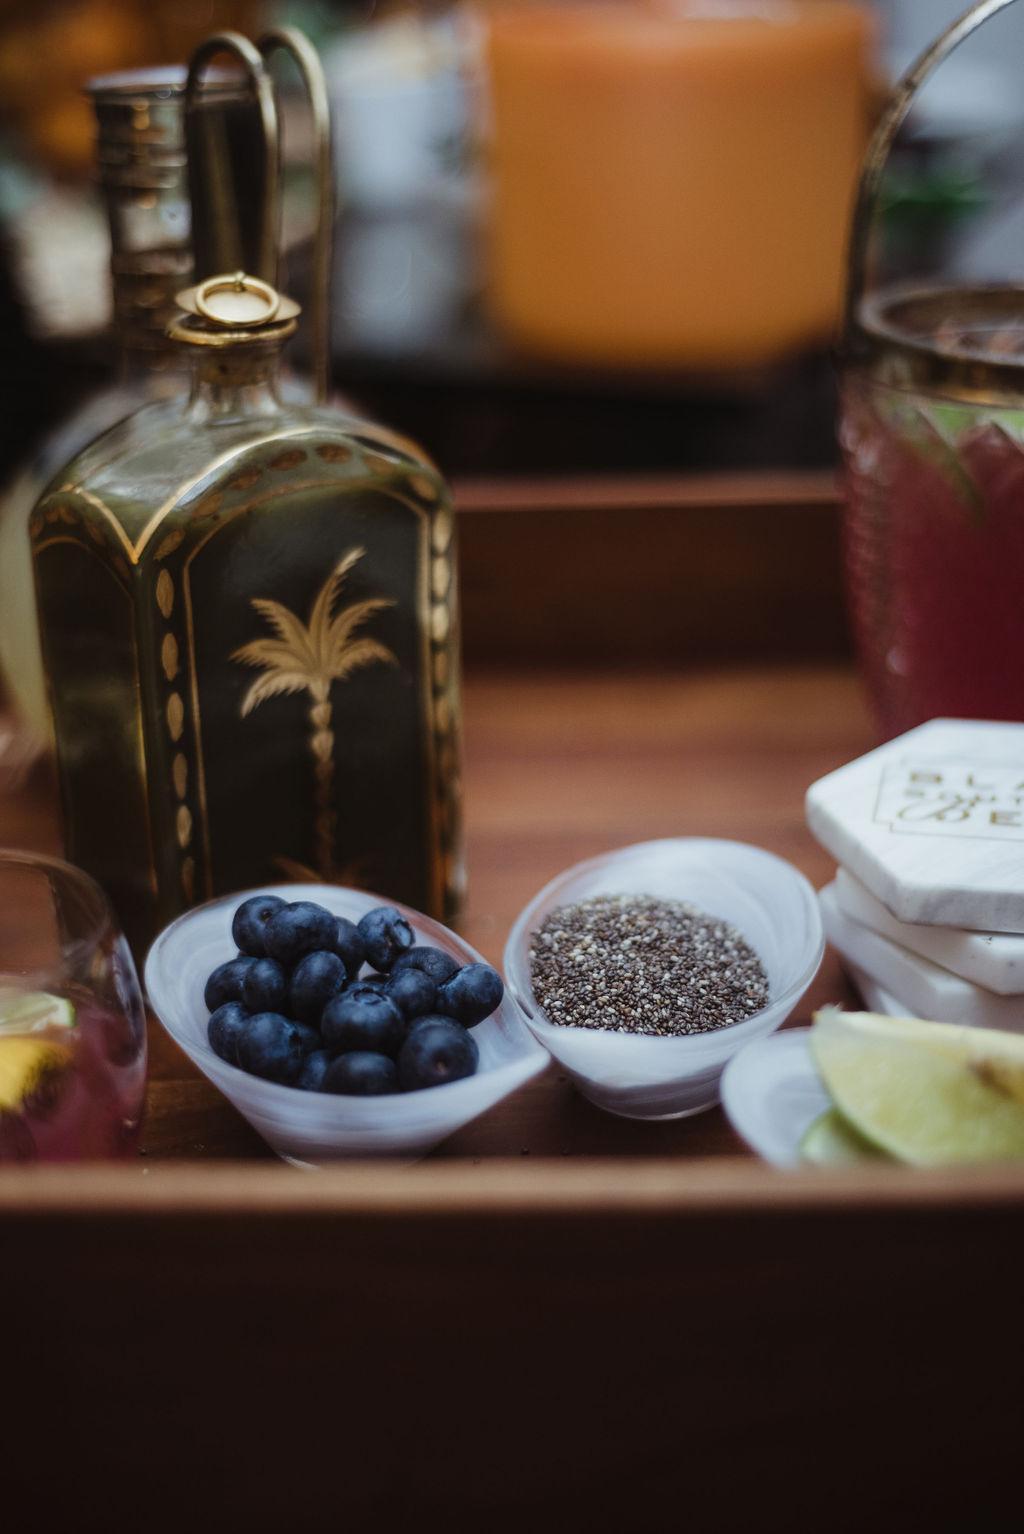 3nBg6zfij63_SahqY48U0GkG0K5eqQKXCrxxg0tRDM4HHYiqhGzdTk4qzgEgBBVPzF18WSYKW2HyqoaZFSN0yIWyc0o7lN1zBNlQ34of6tKKZ9QquXhnDWCSRwwHCbgtQT8a6kYs How to Host A Healthy Lowcountry Sunday Brunch: Honoring Tradition While Improving Health